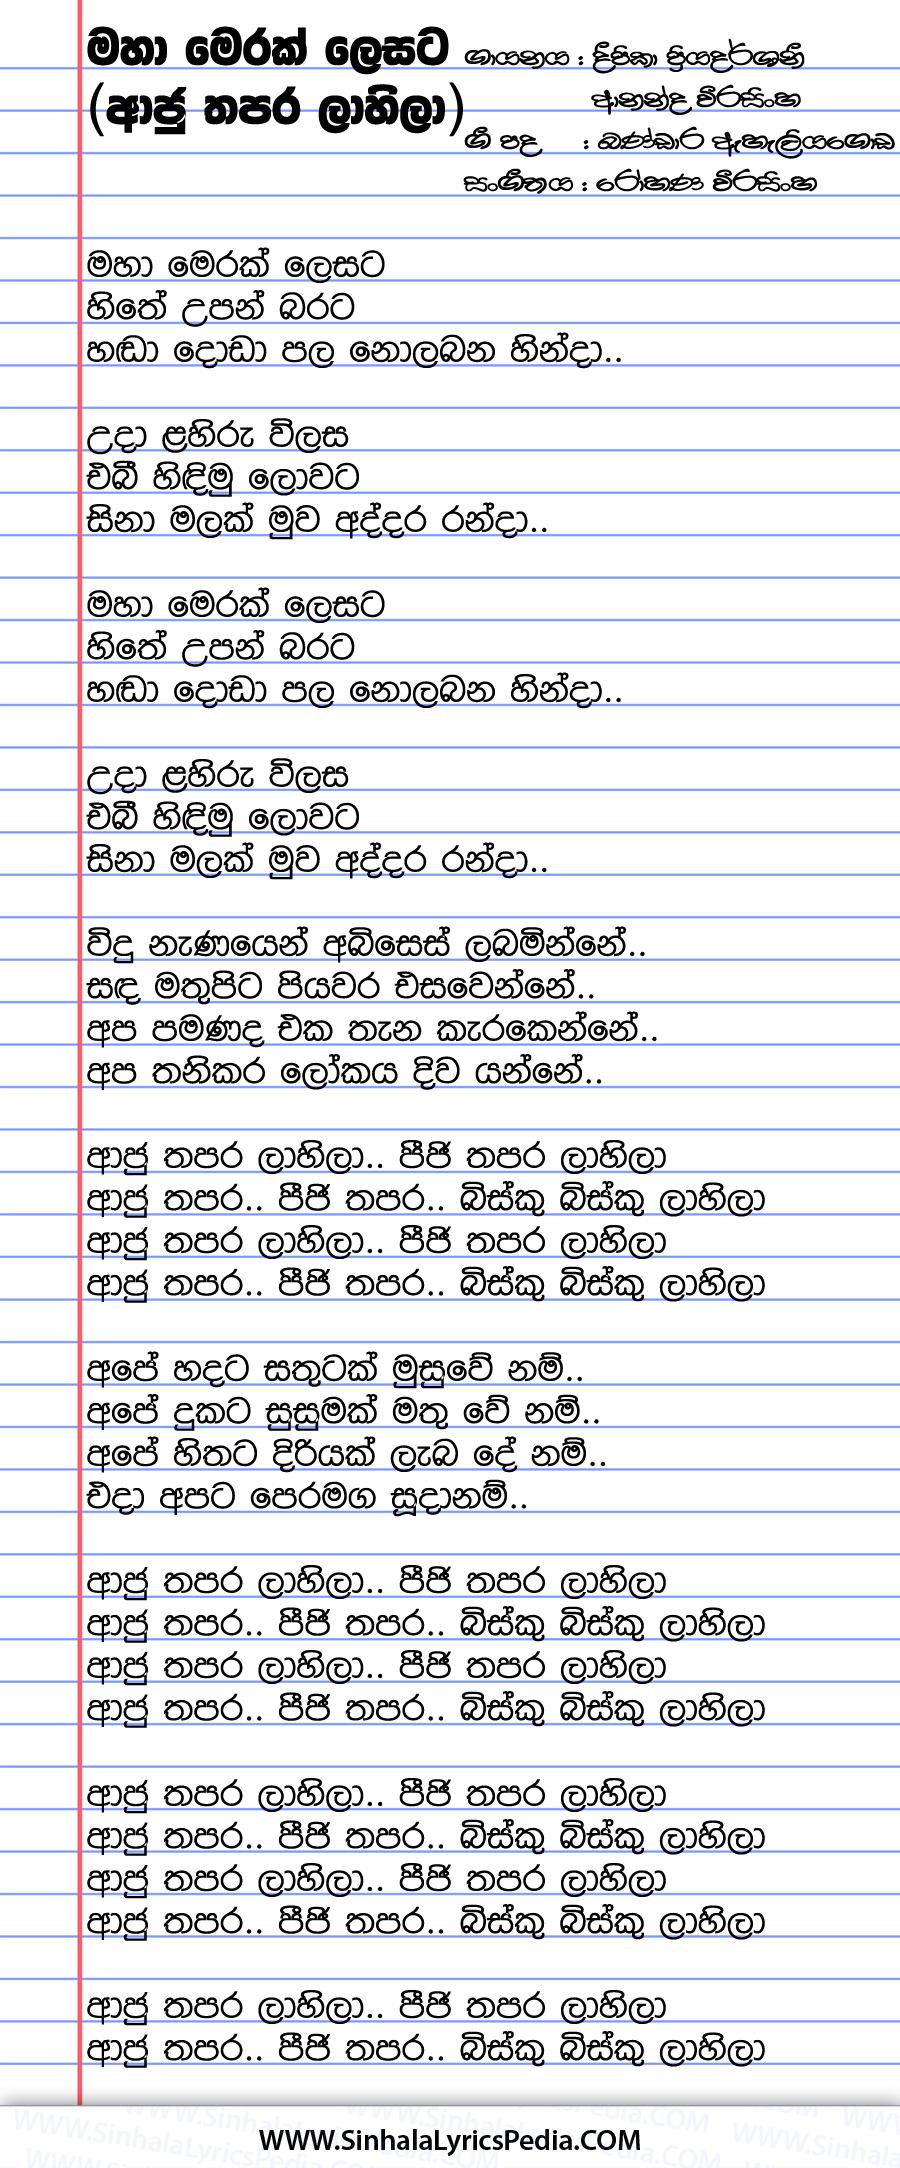 Maha Merak Lesata (Aju Thapara Lahila) Song Lyrics